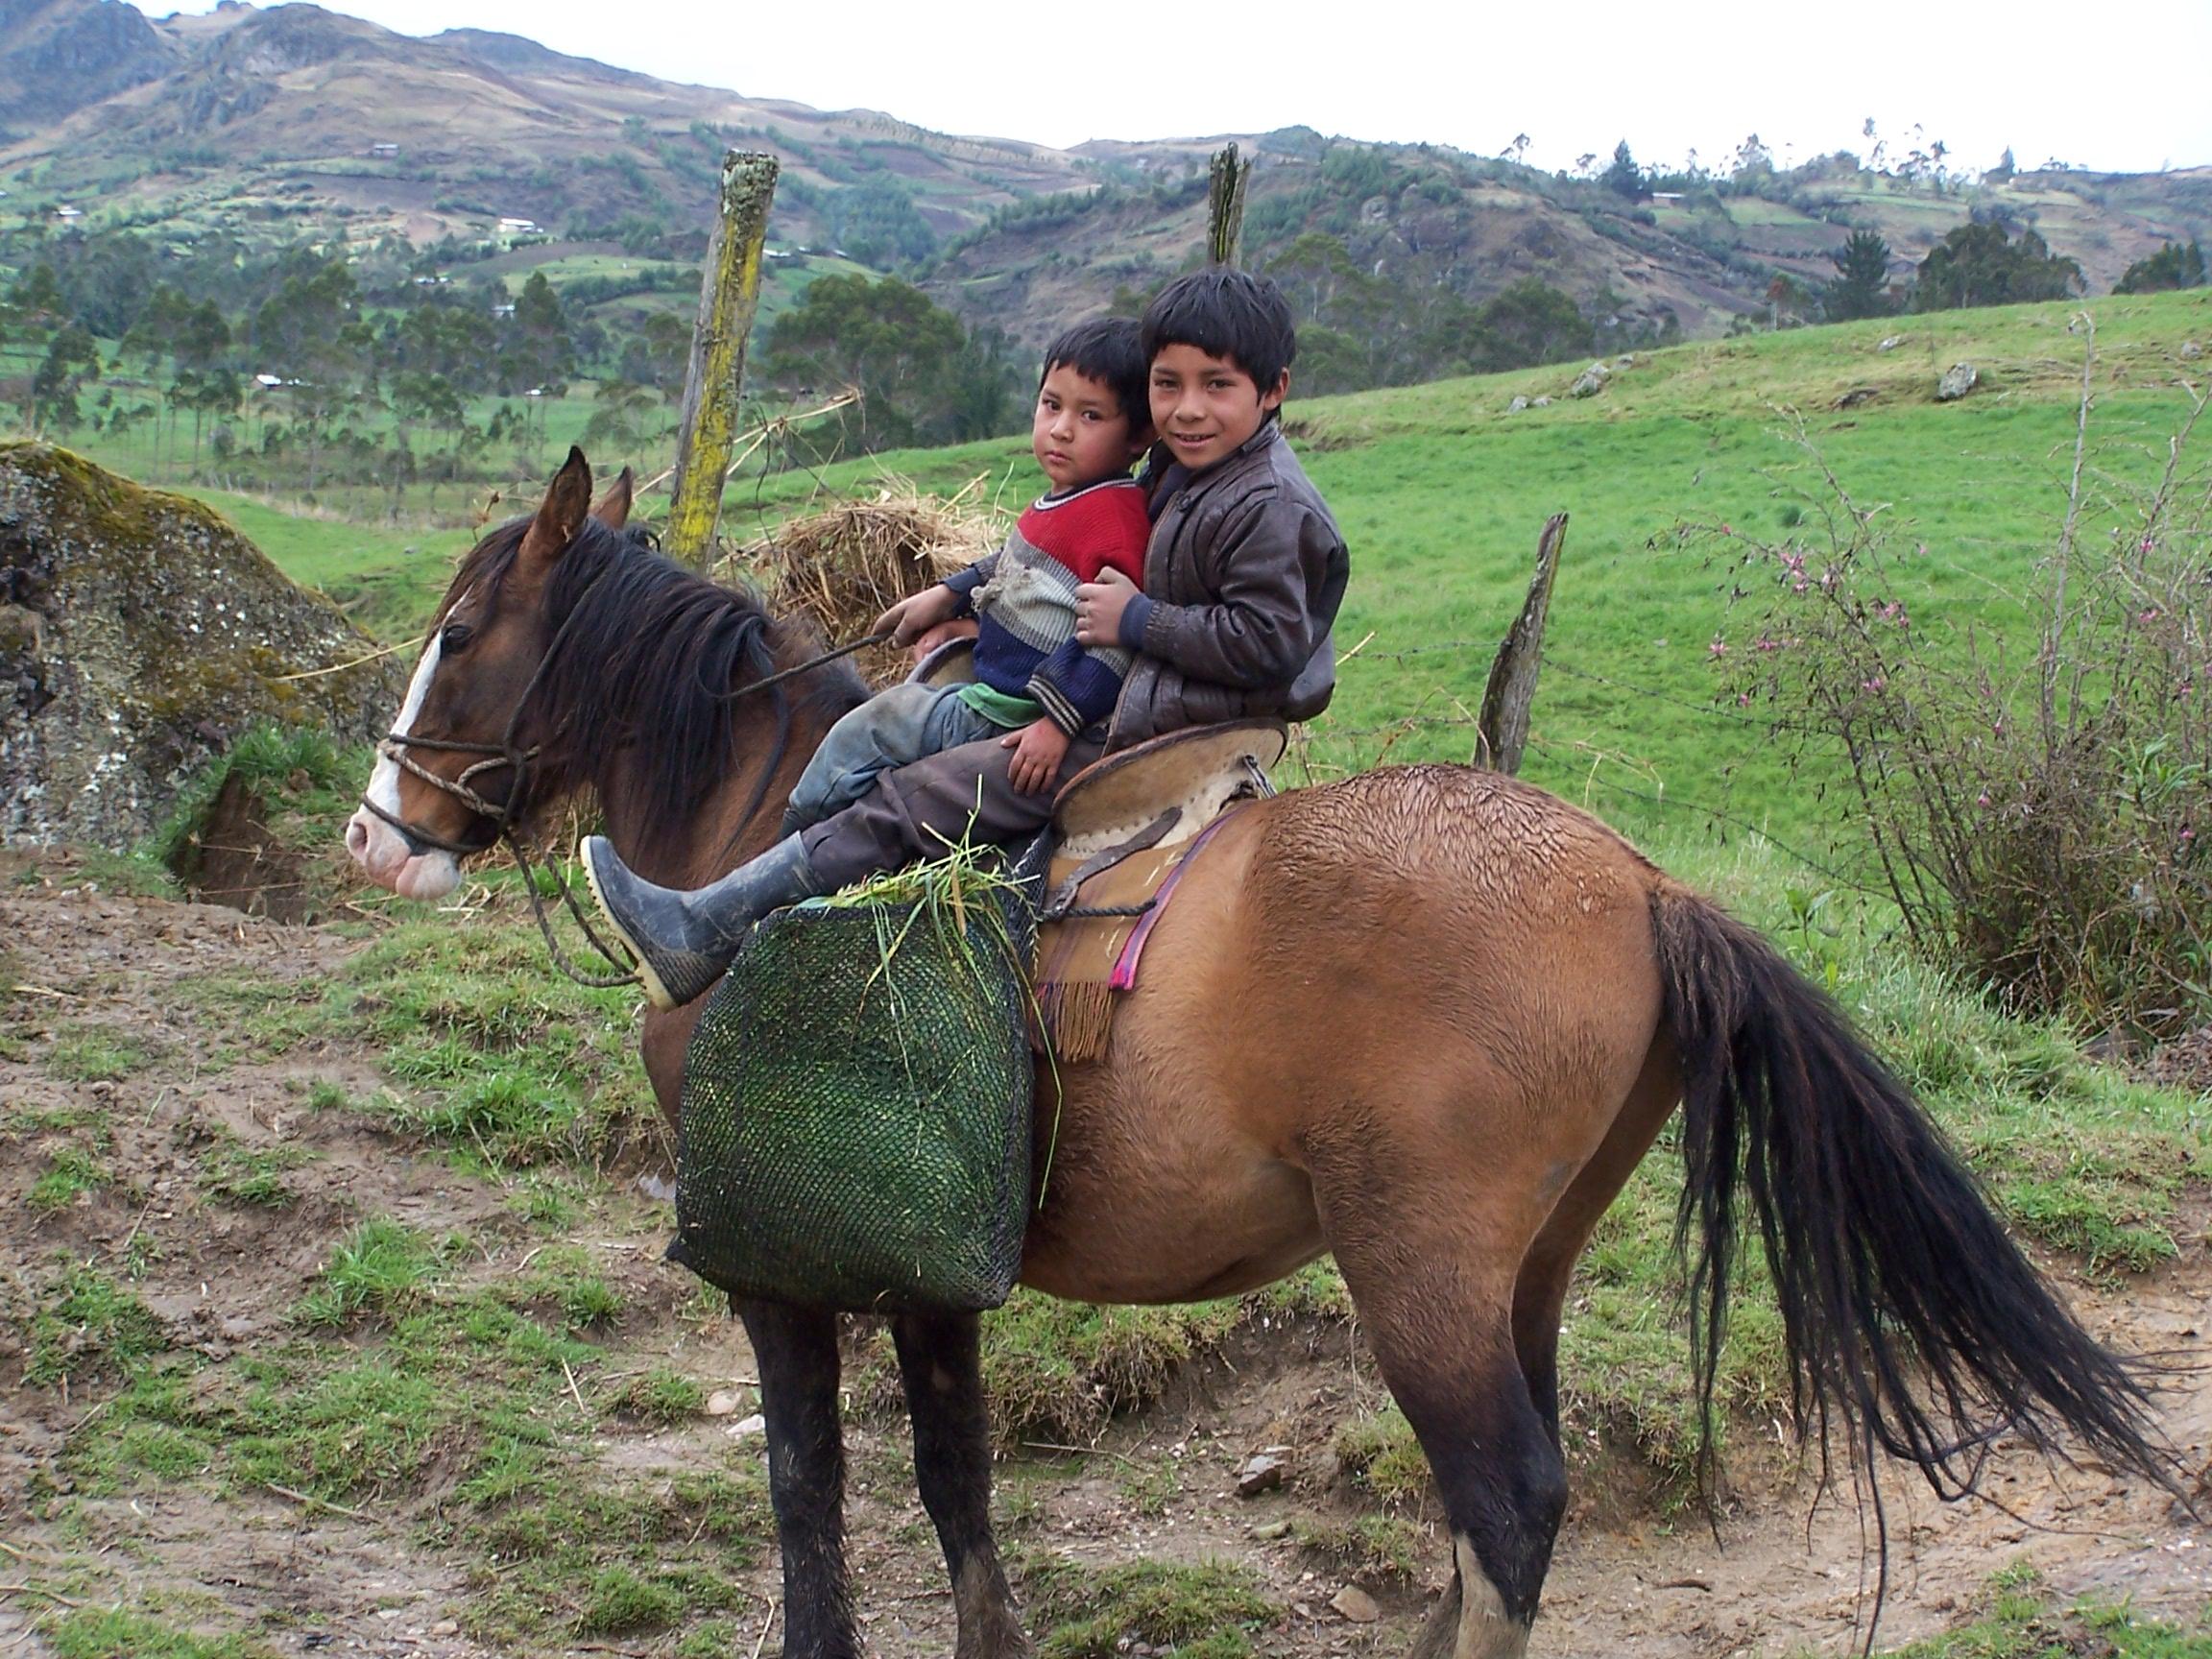 Niu00f1os peruanos recogiendo hierba